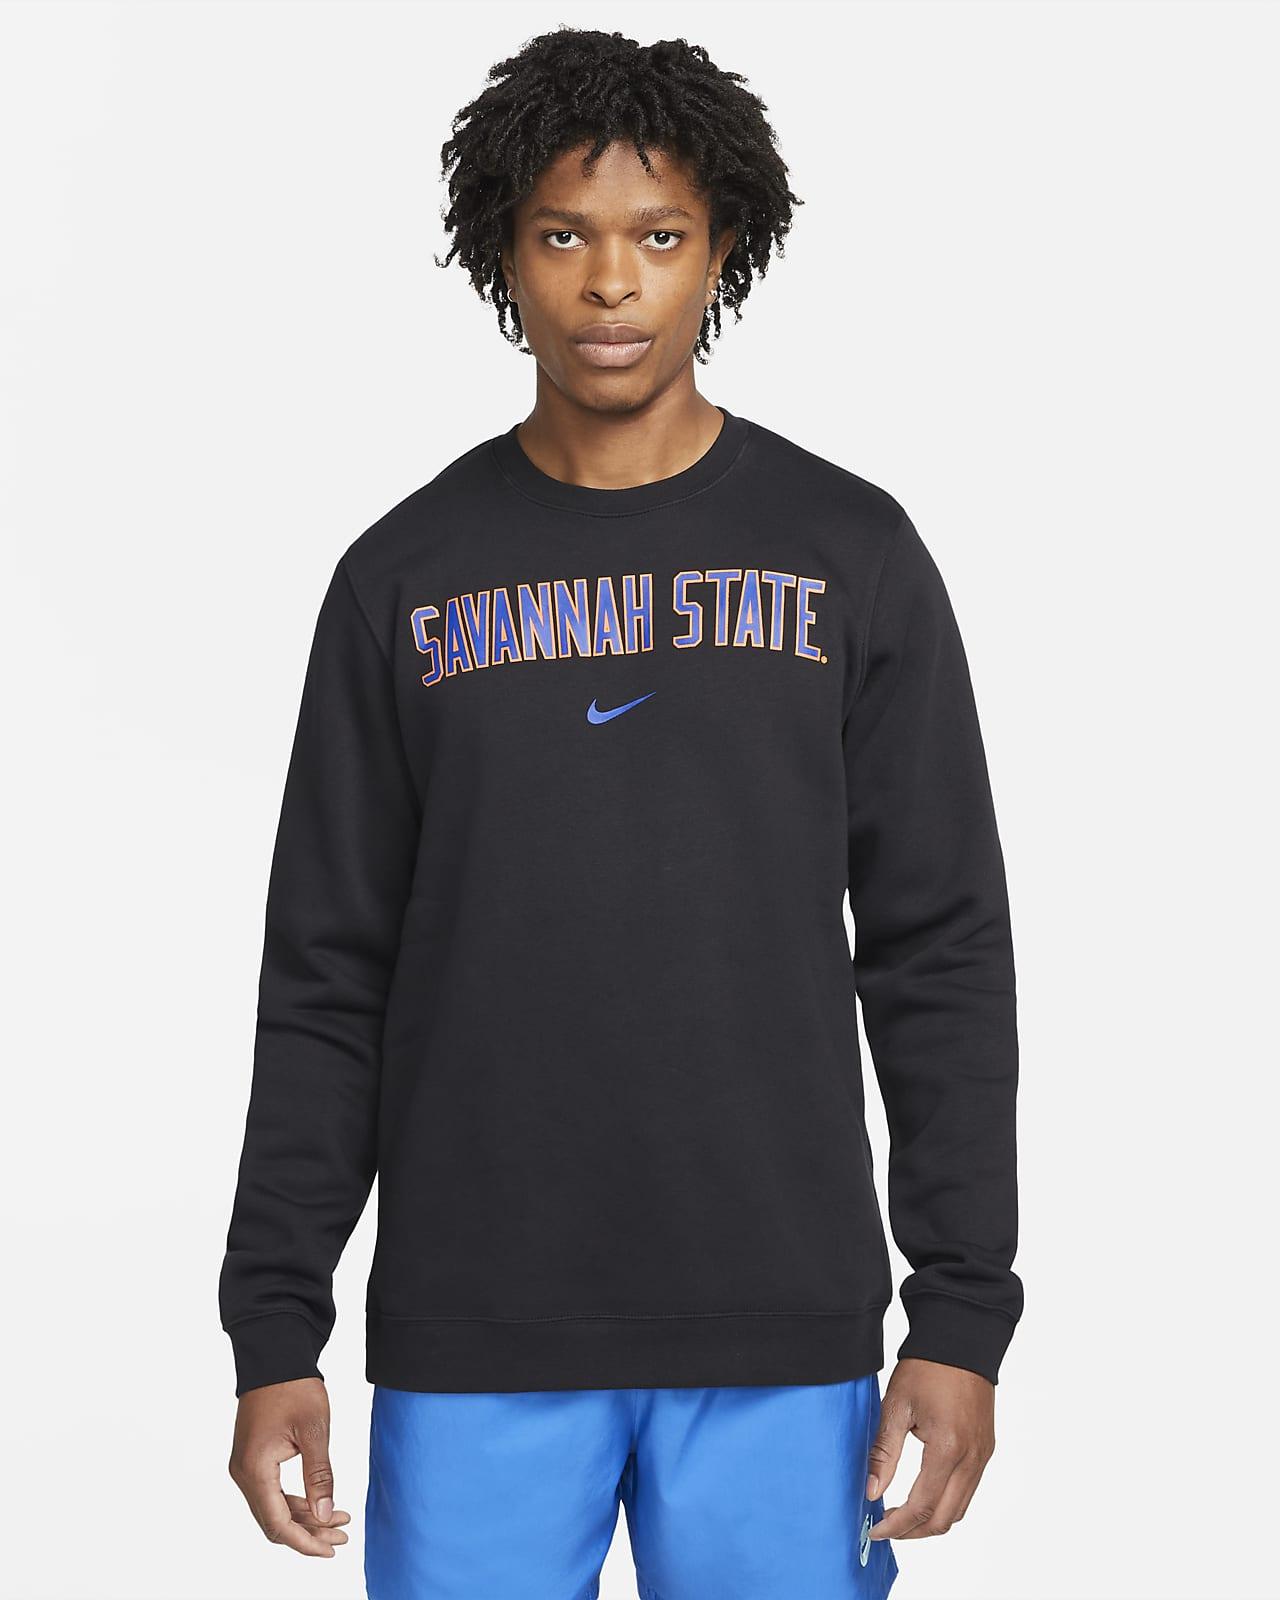 Nike College Club Fleece (Savannah State) Crew Sweatshirt